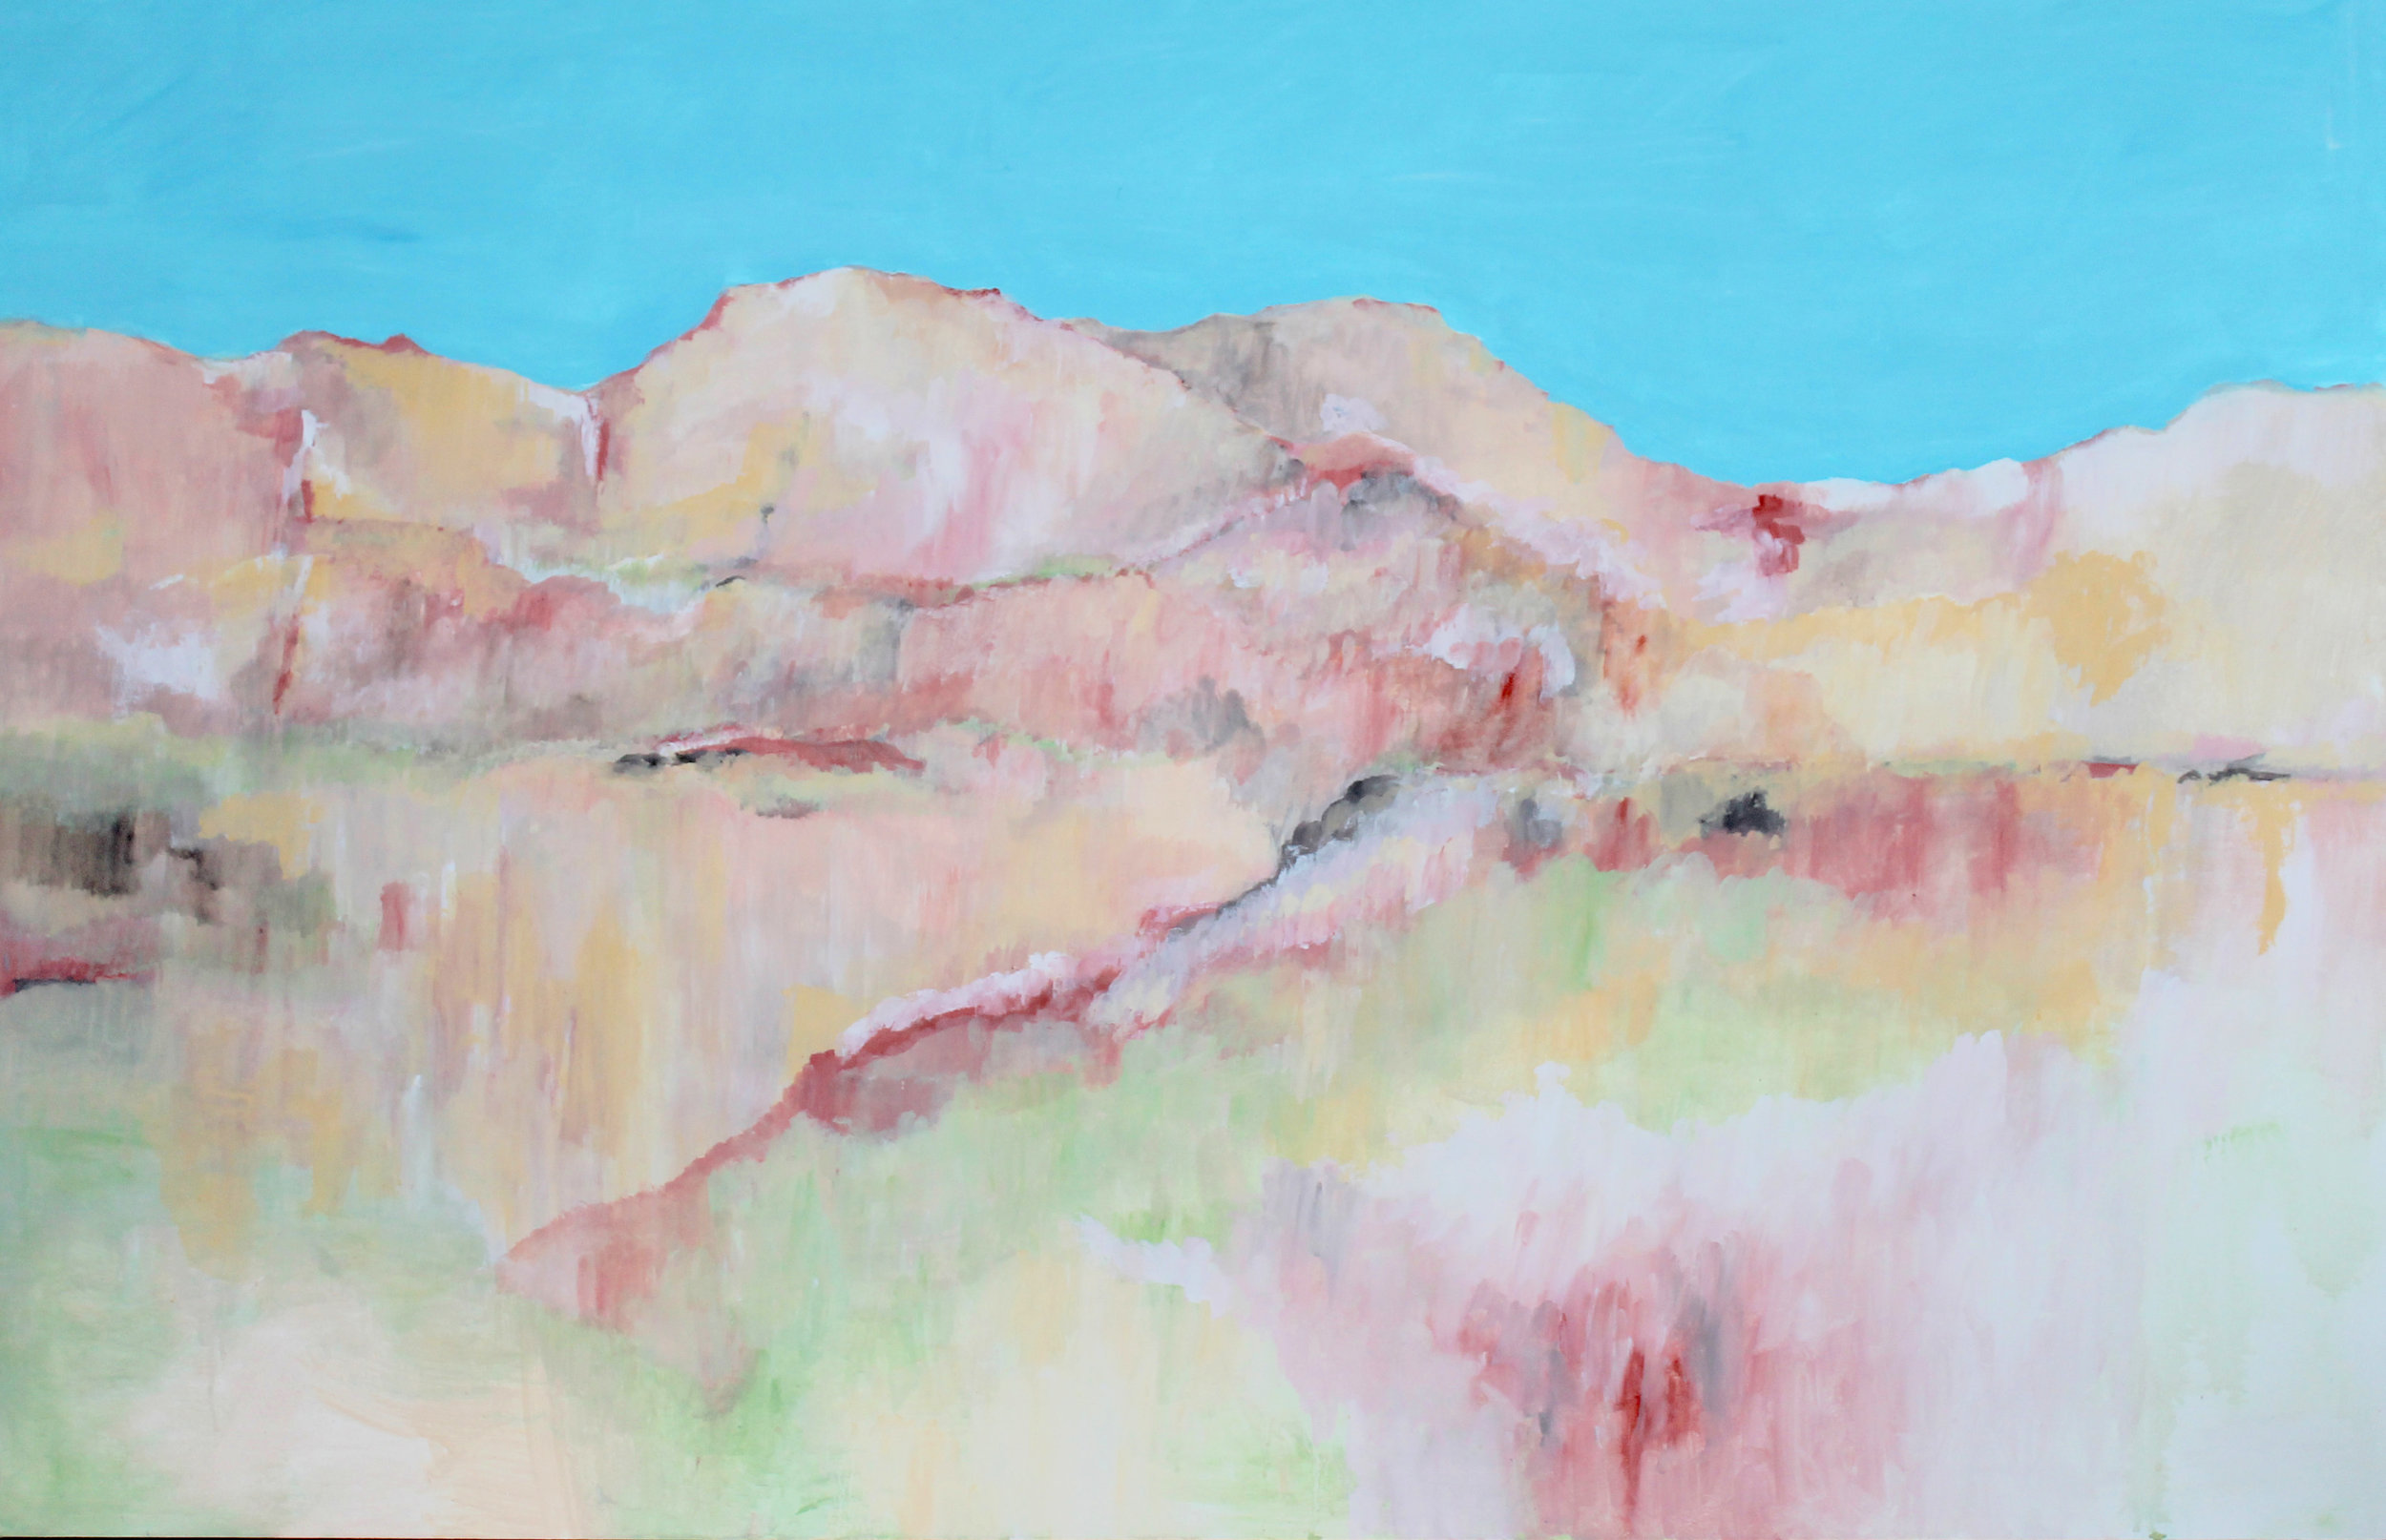 Escarpment  2016 acrylic on canvas 170 x 110 cm